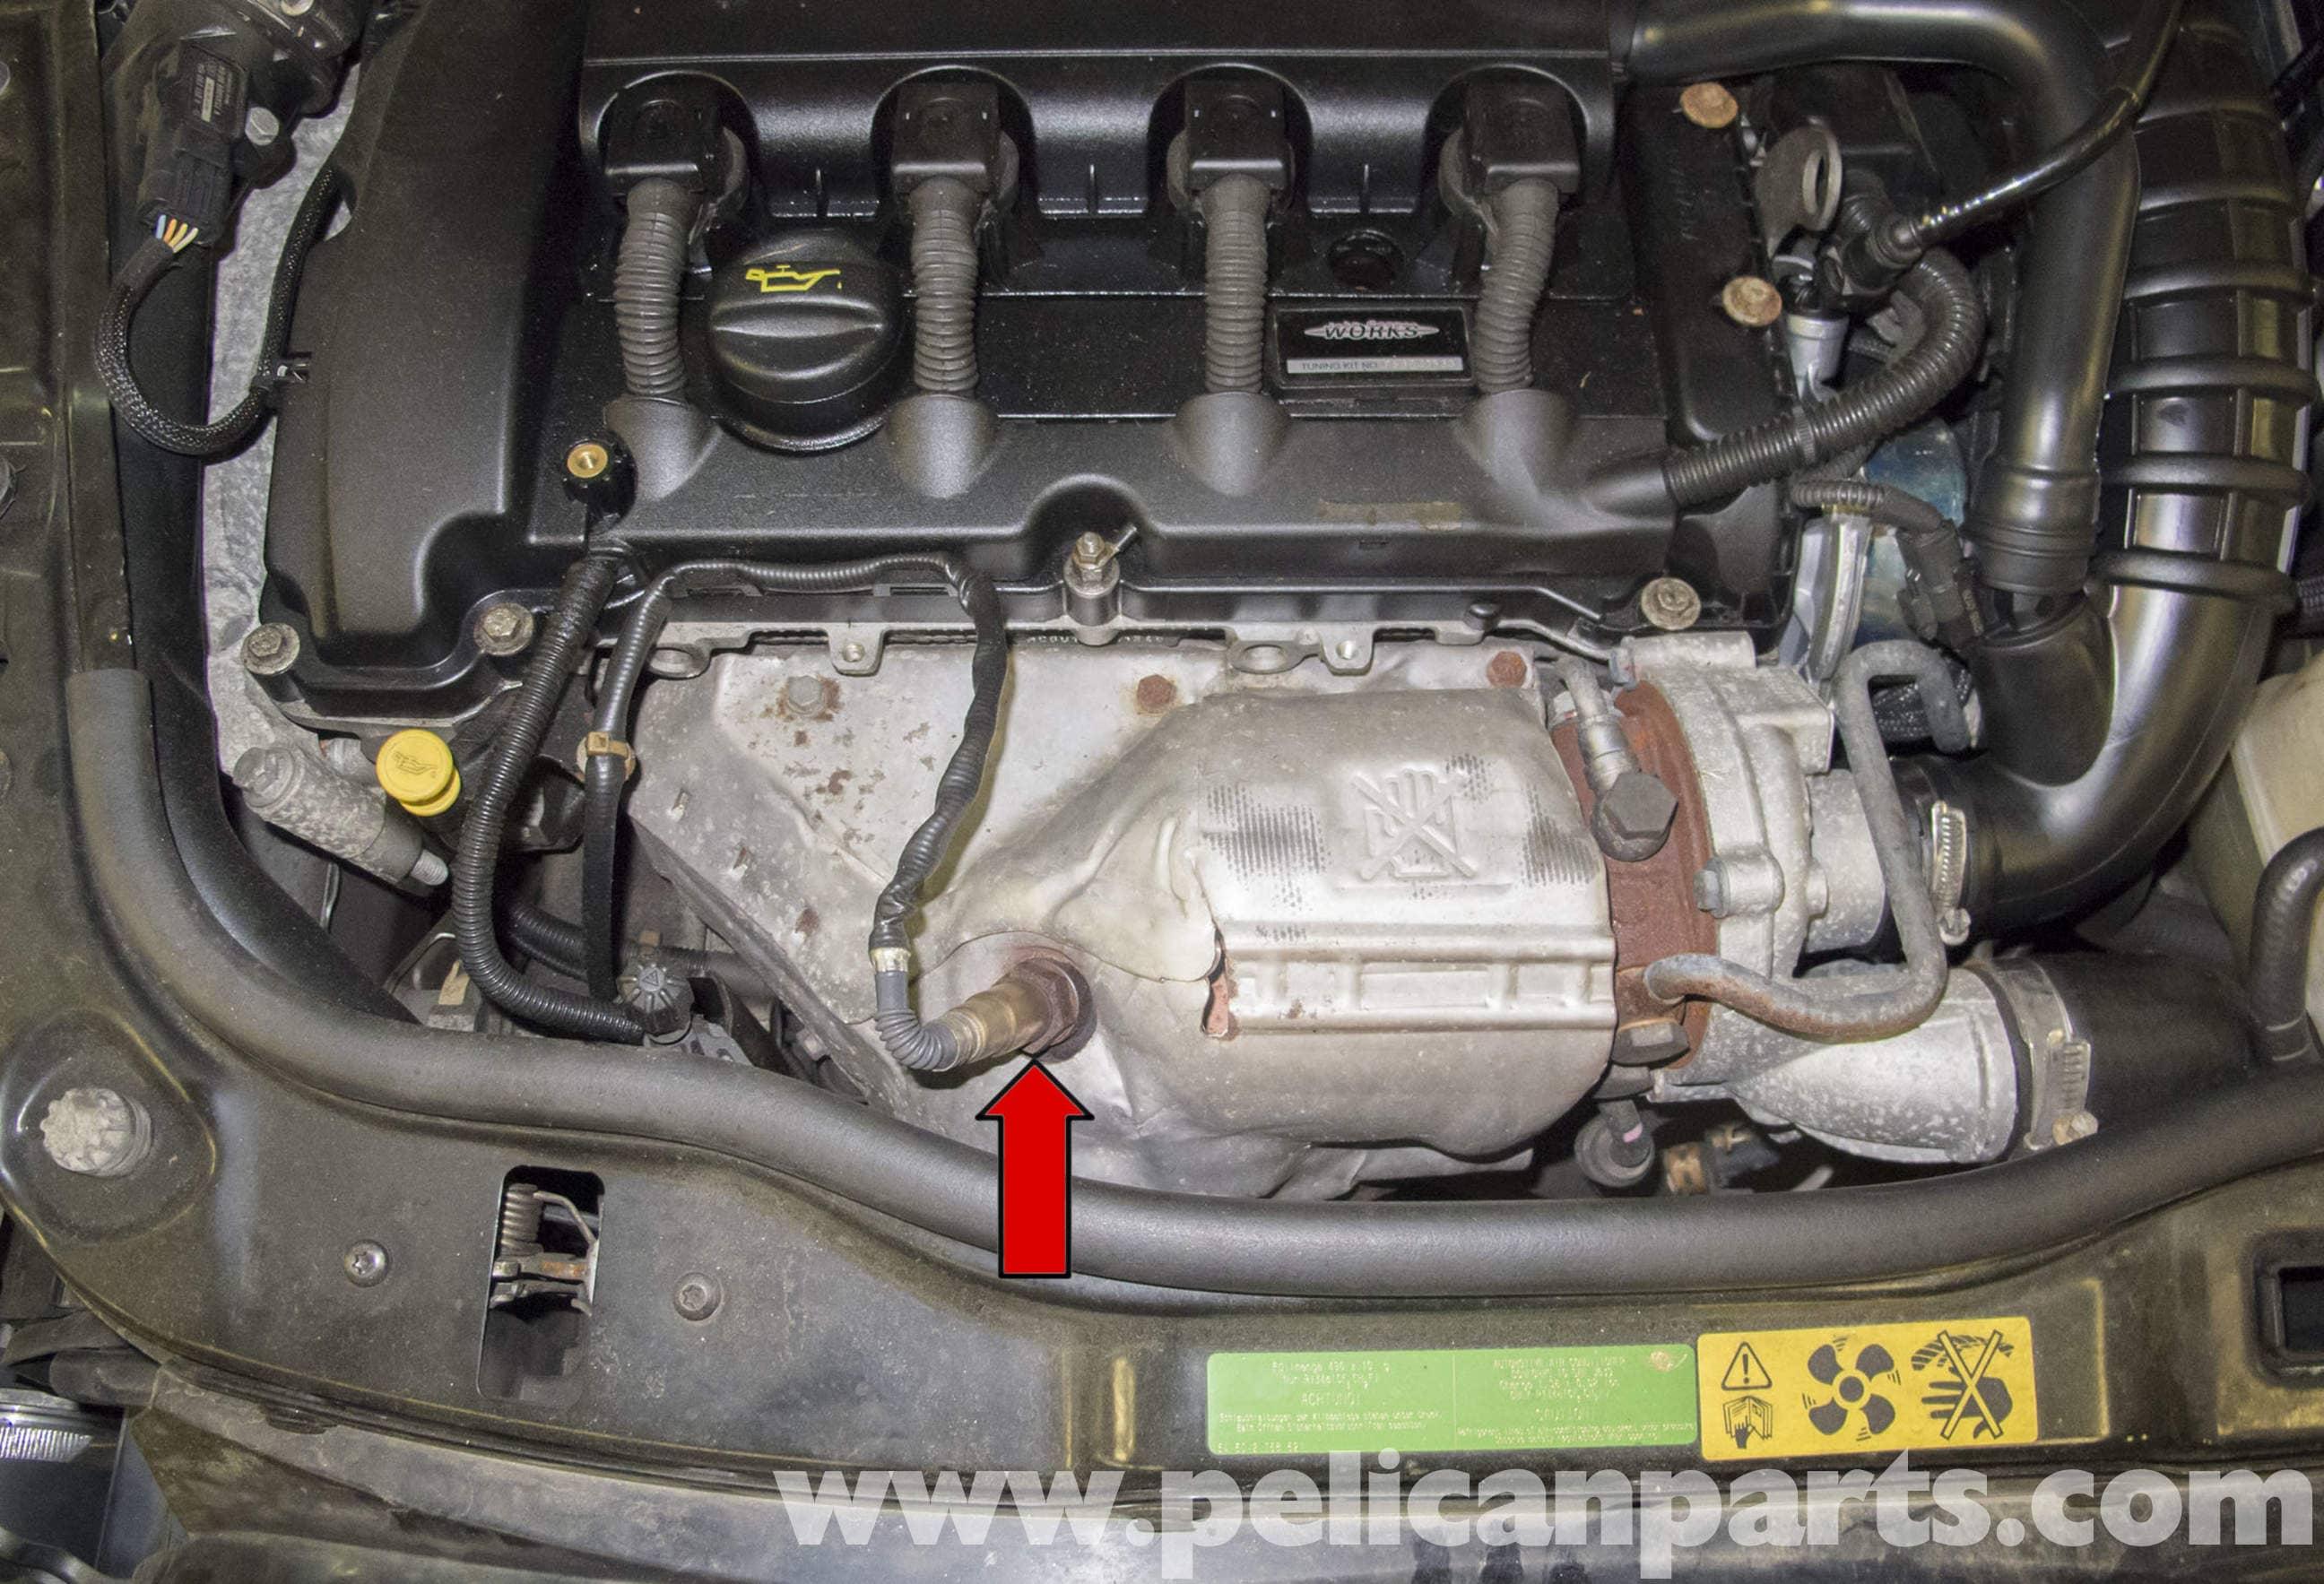 pic01 R Wiring Harness on best street rod, fuel pump, hot rod, fog light, universal painless,